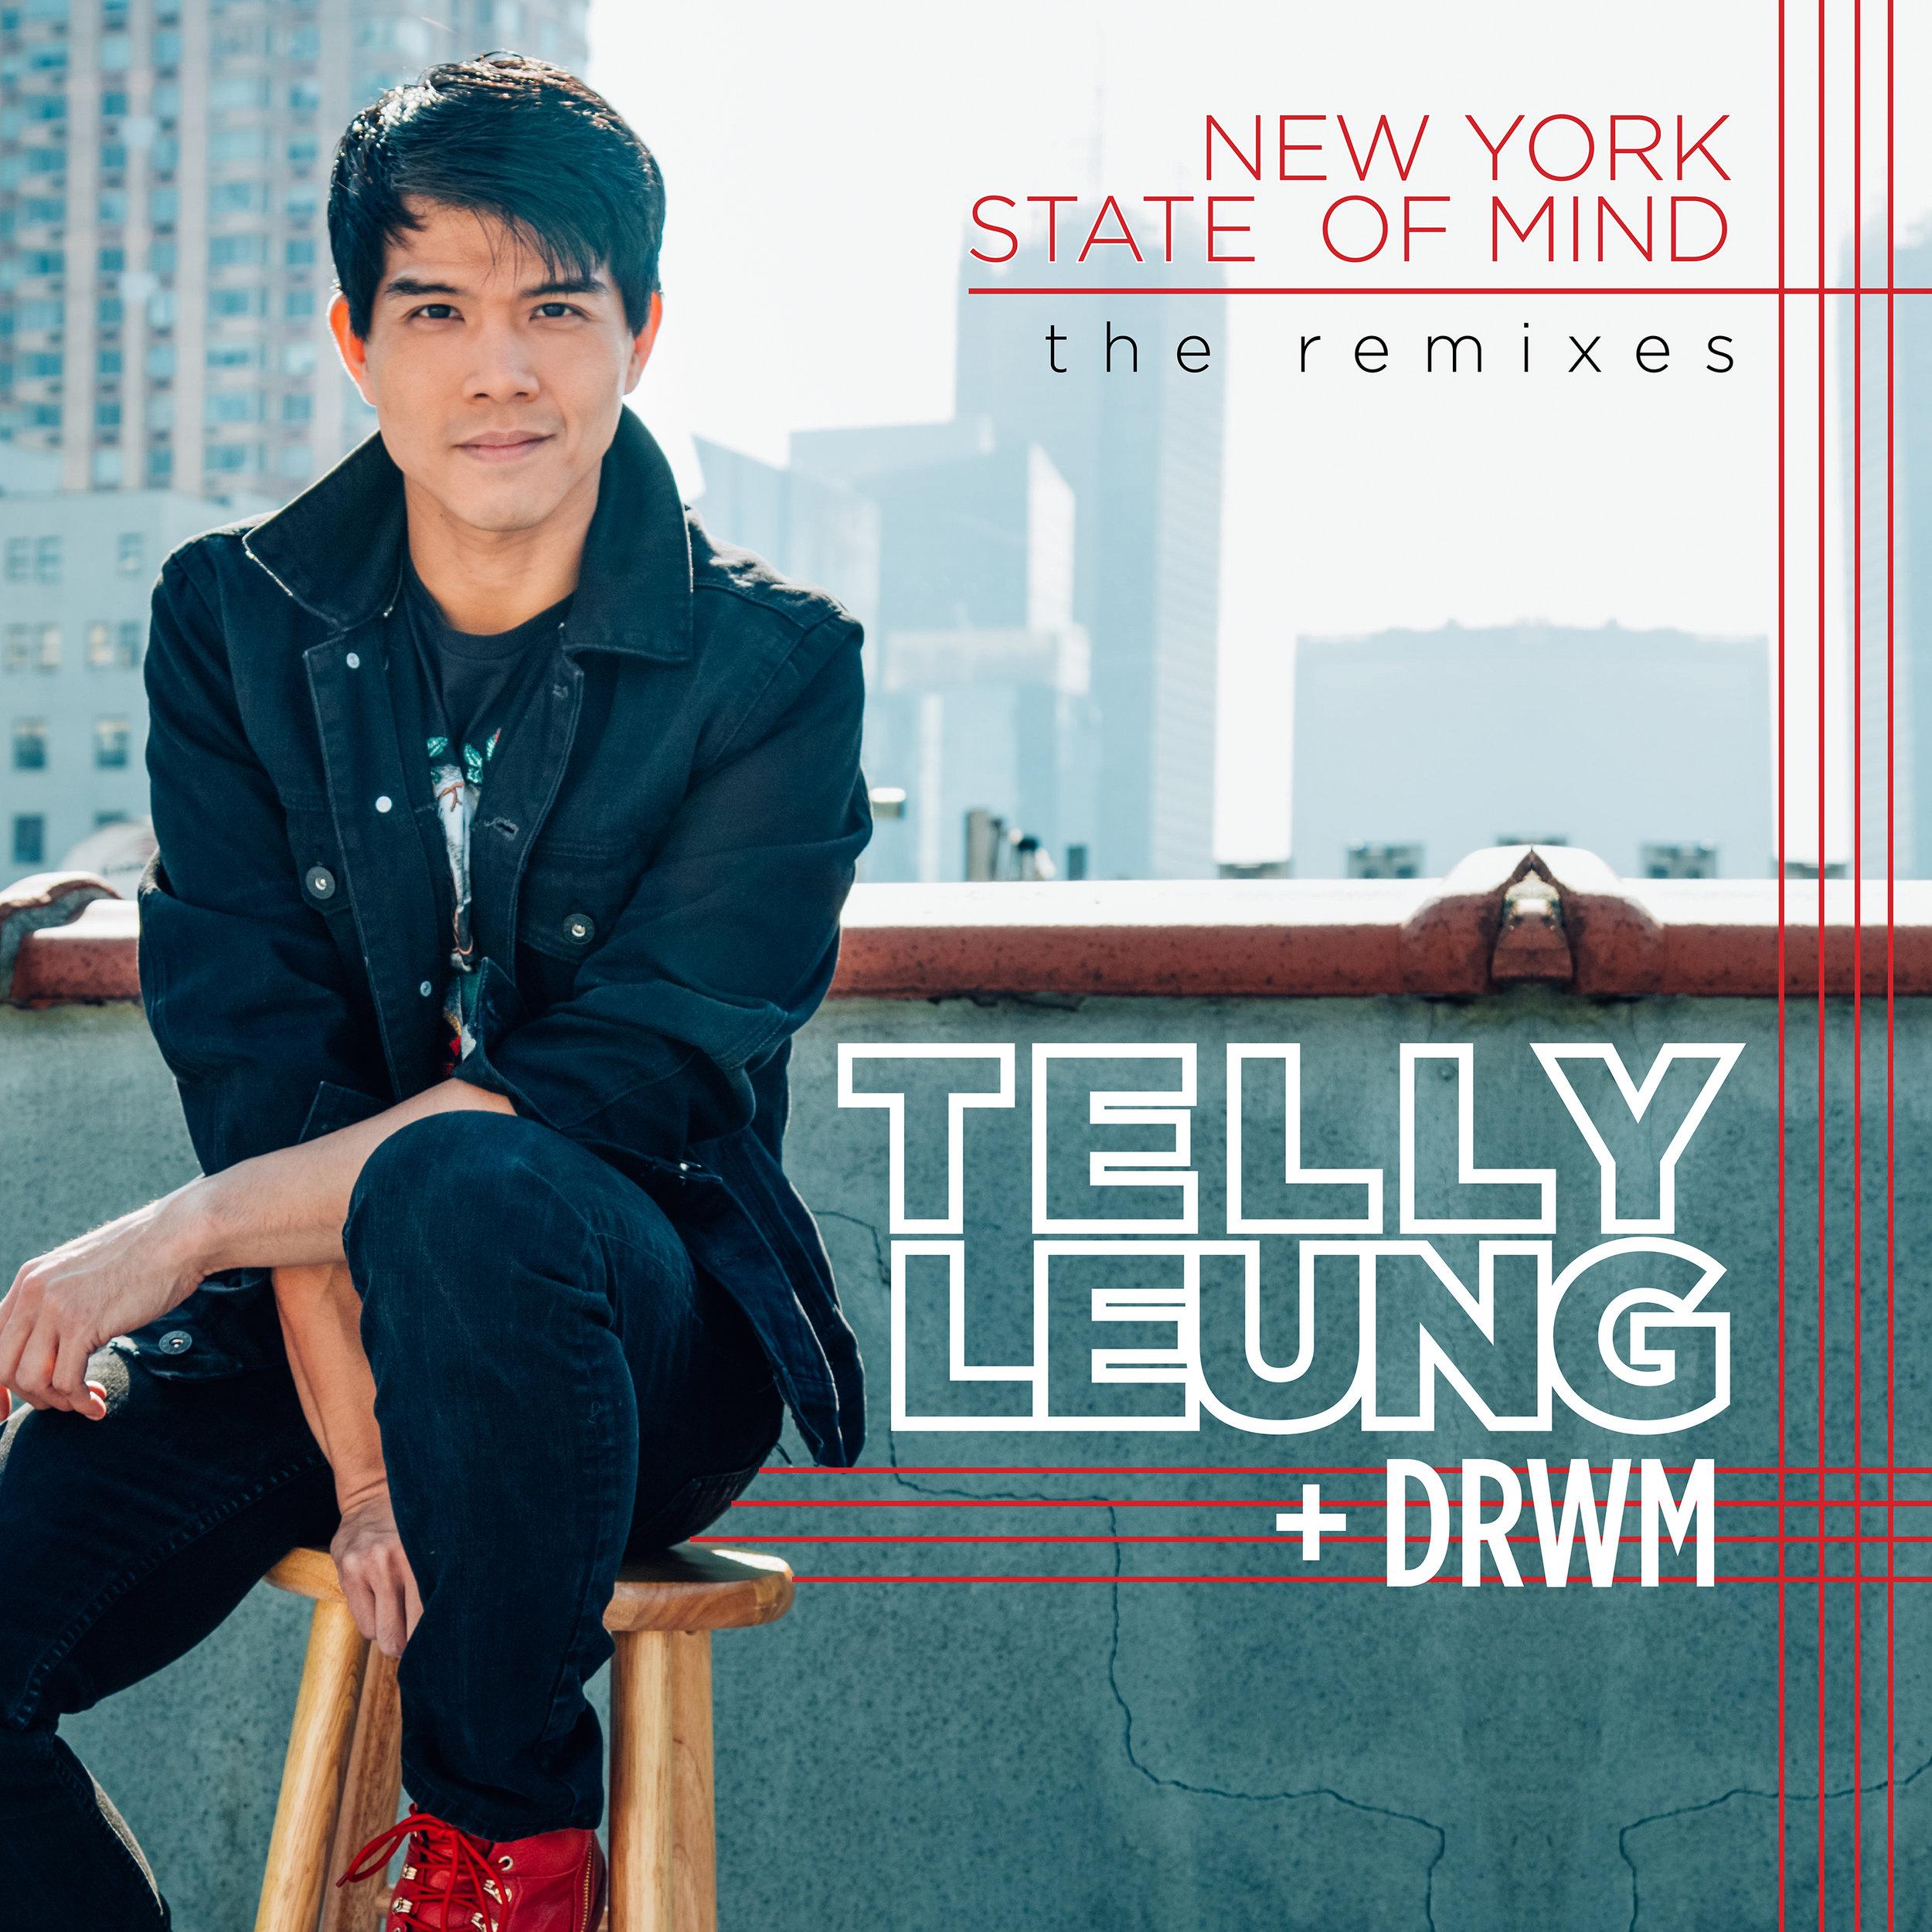 Broadway's Telly Leung